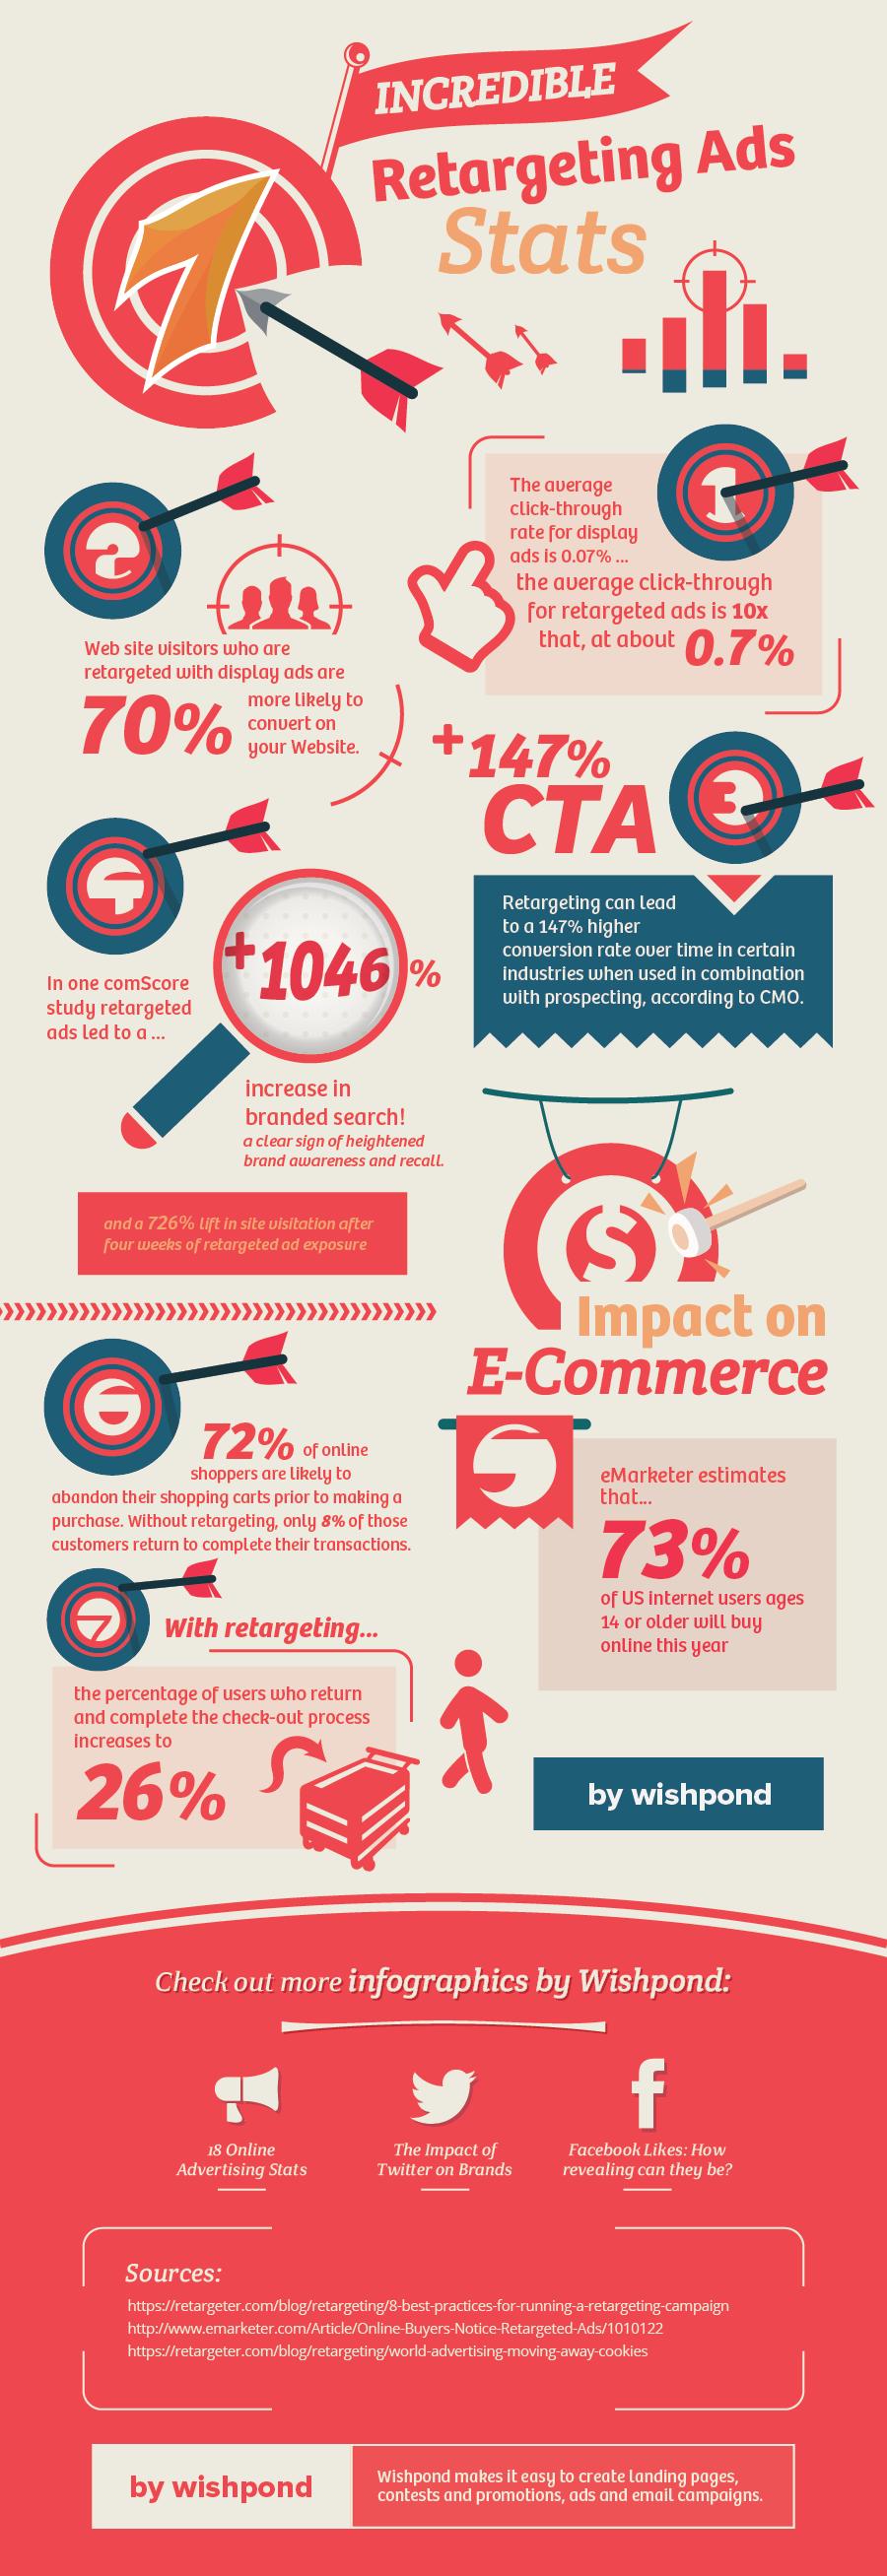 17 Incredible Retargeting Ad Statistics 2014 - #Infographic #Socialmedia